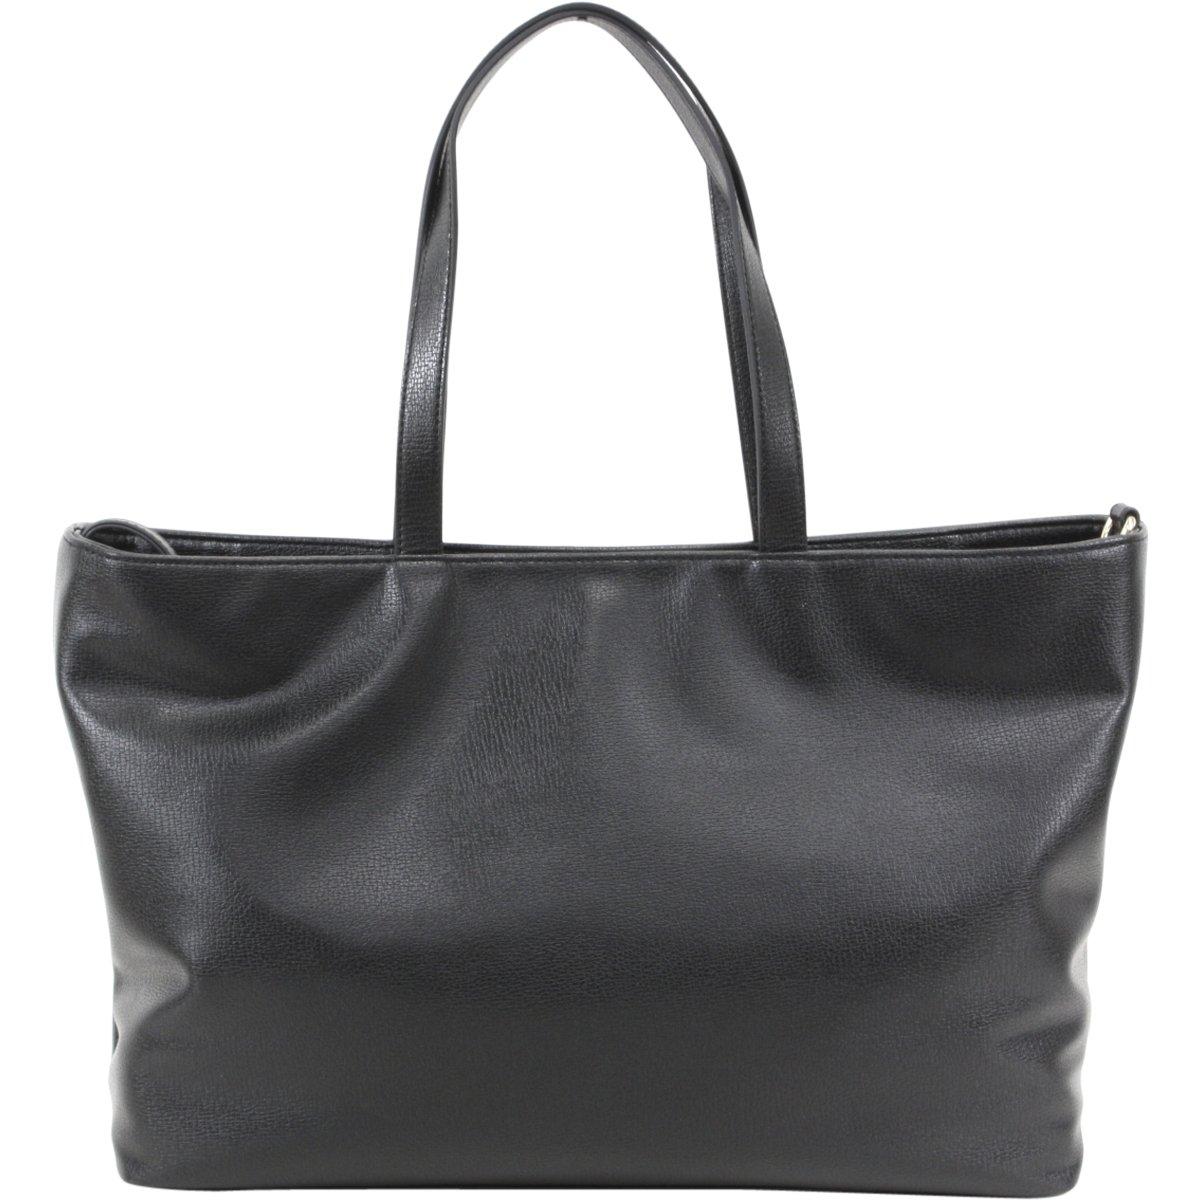 Love Moschino shopping bag Pu black by Love Moschino (Image #2)